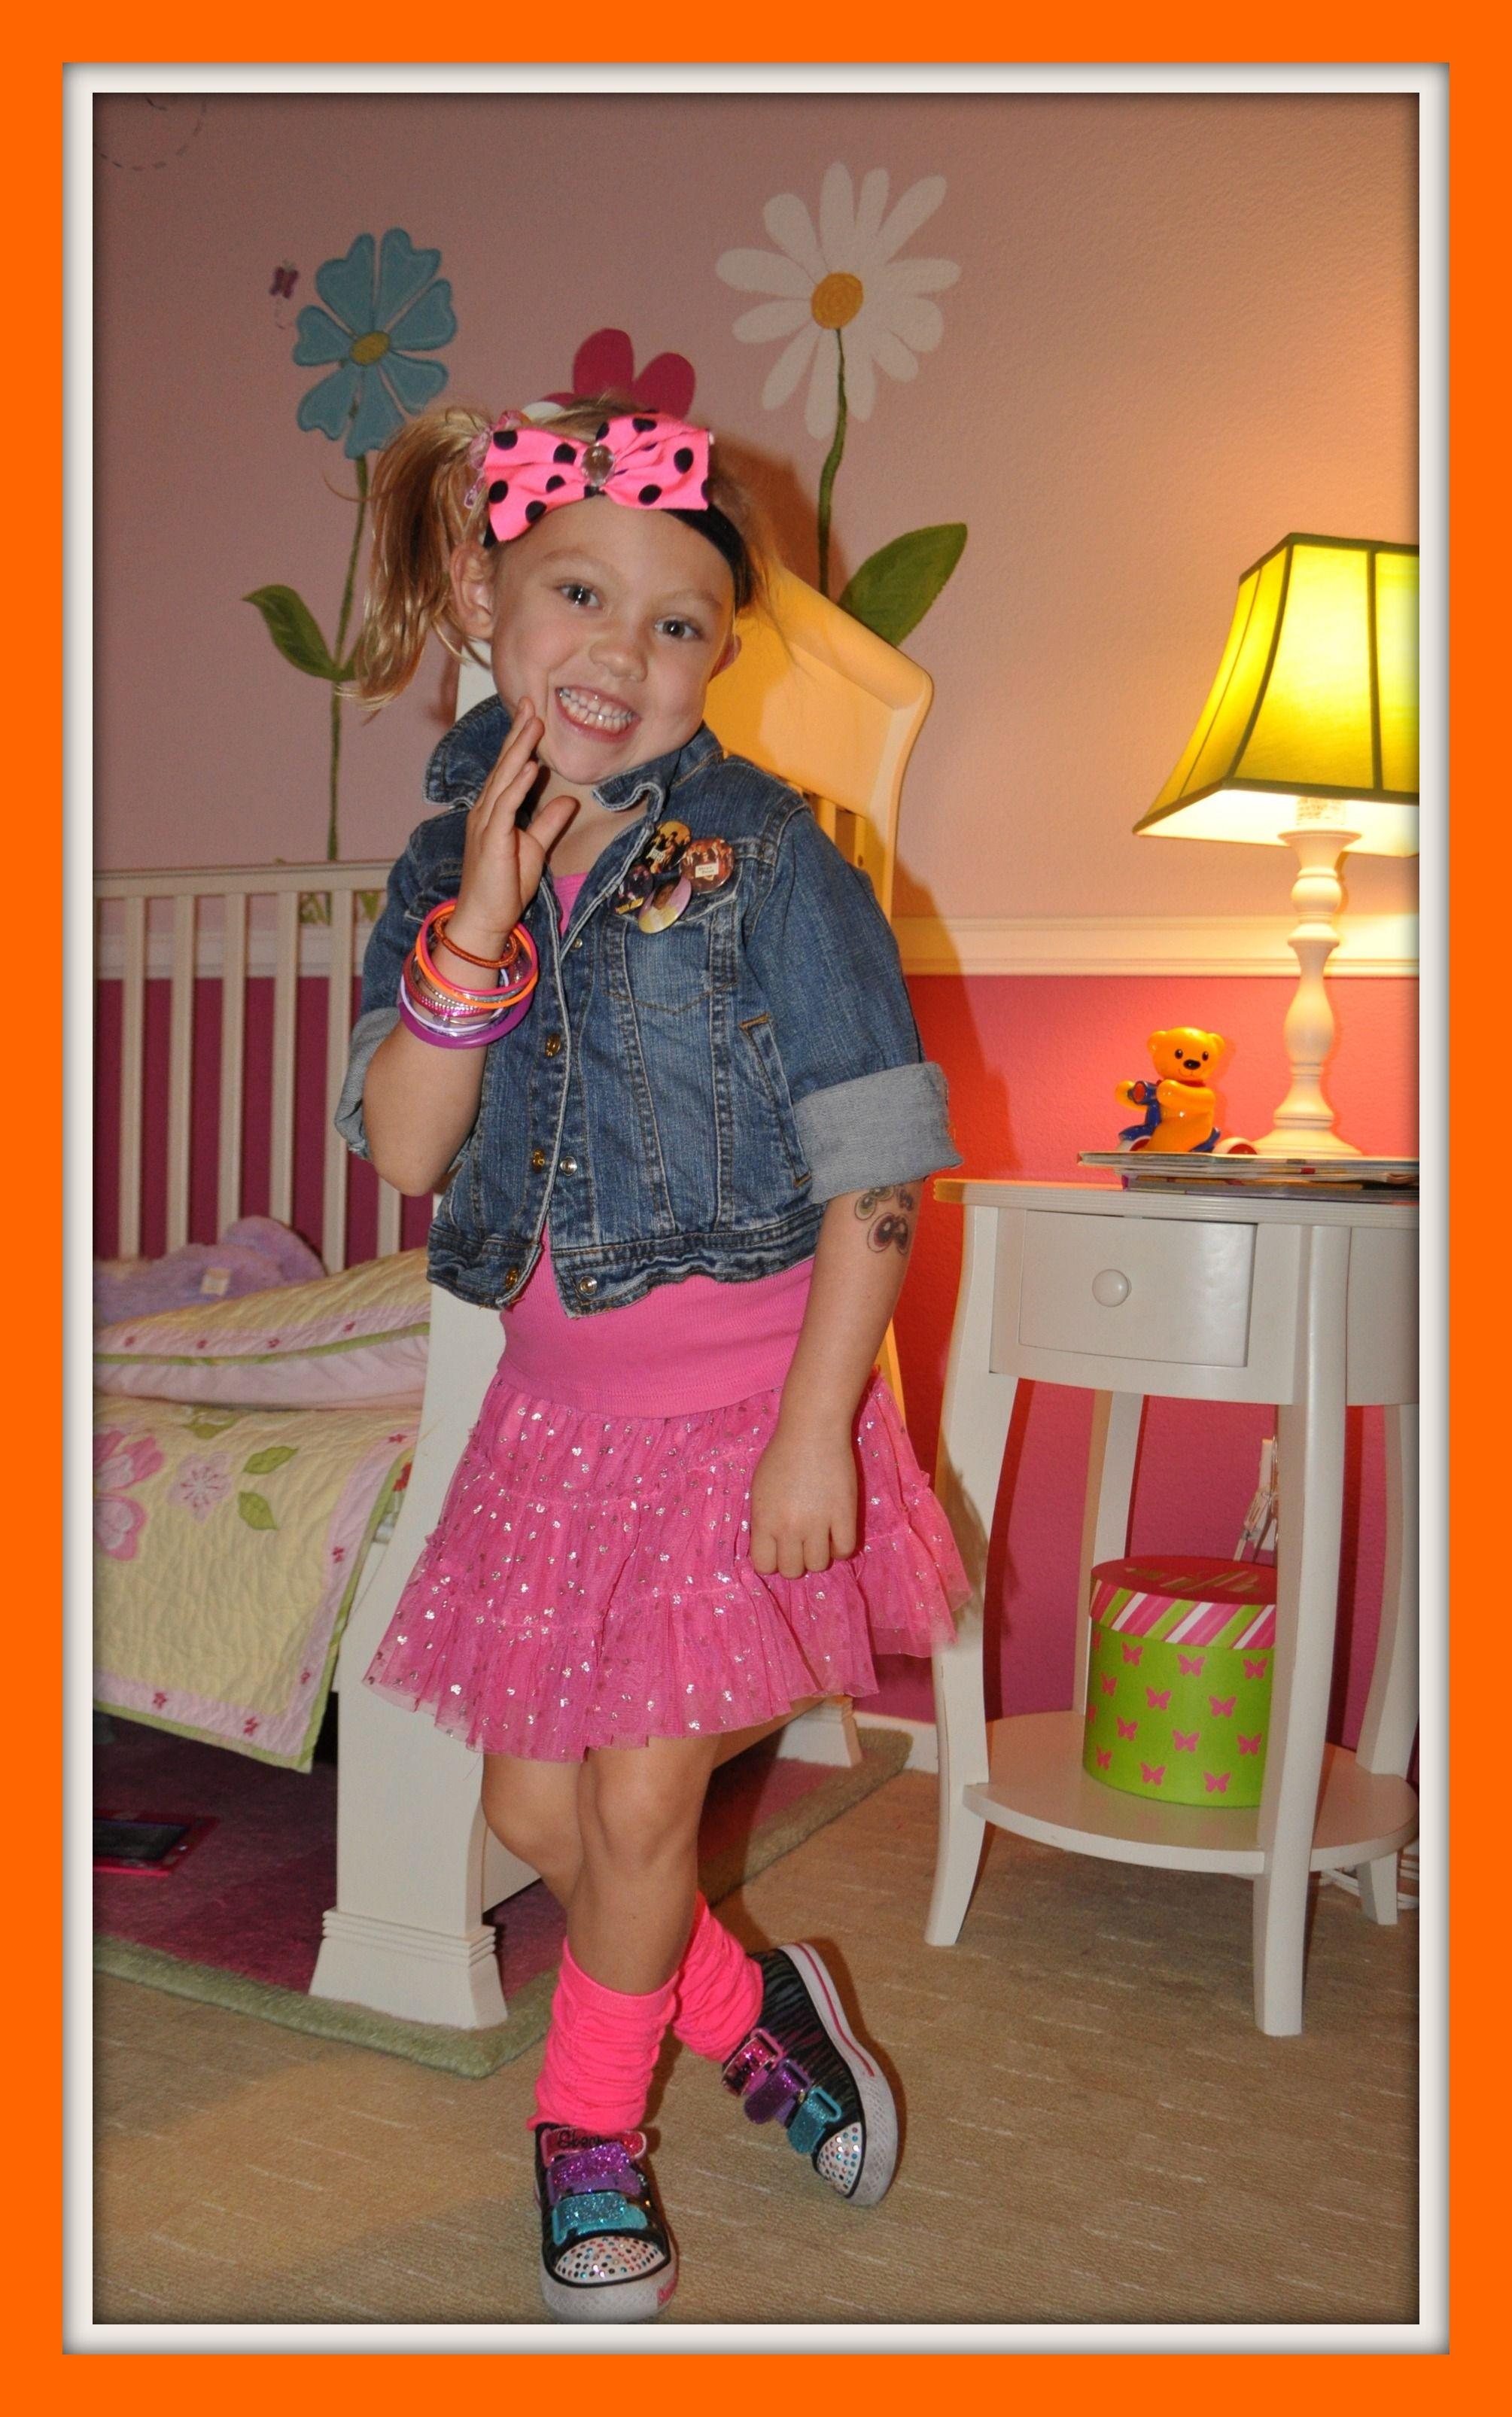 Costume diy  for girls easy cheap last minute costumes also best images ideas children rh pinterest